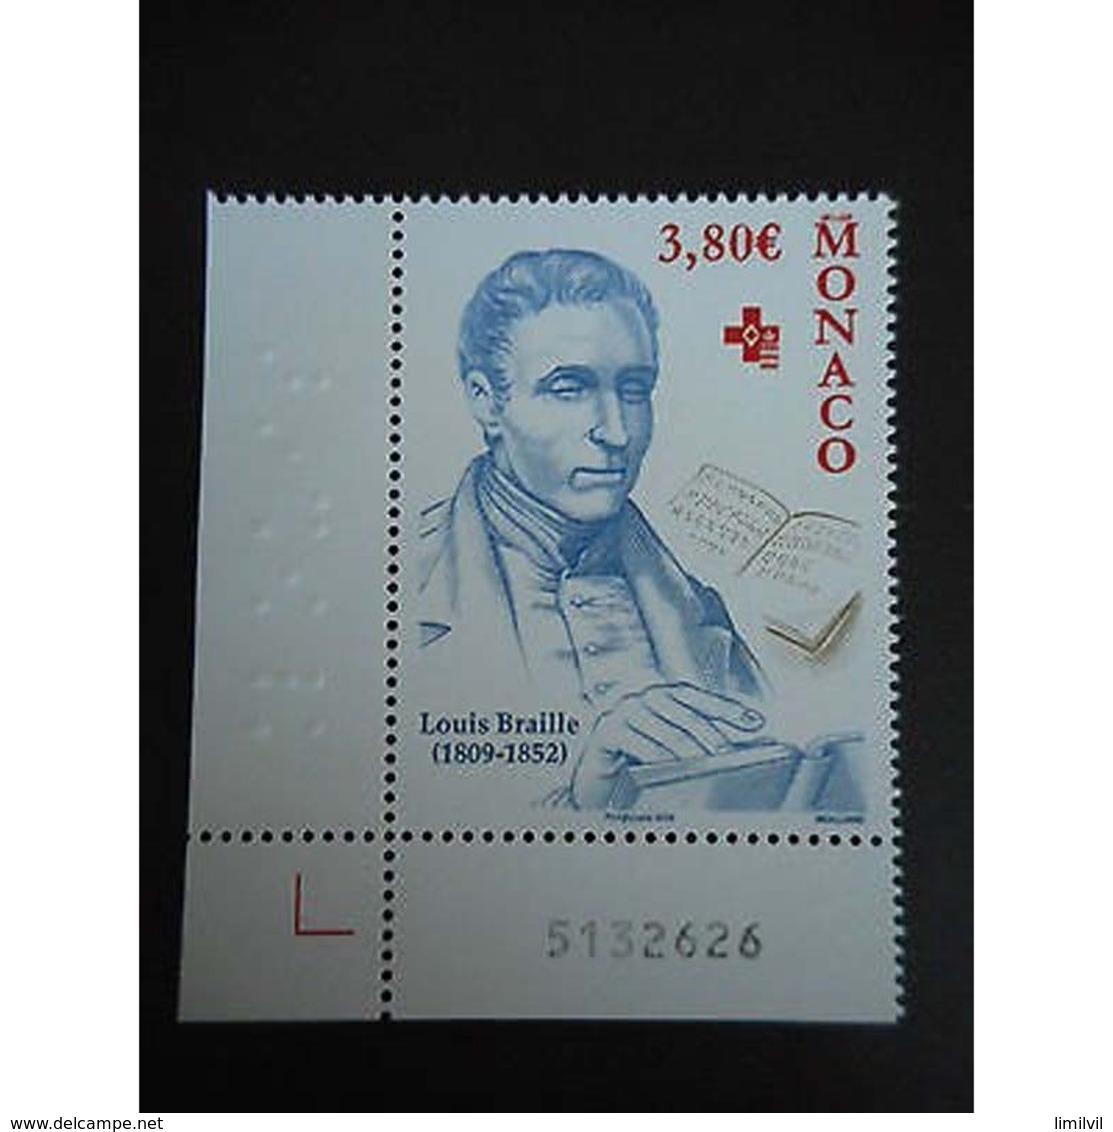 Timbre N° 2677 Neuf ** - Louis Braille - Monaco